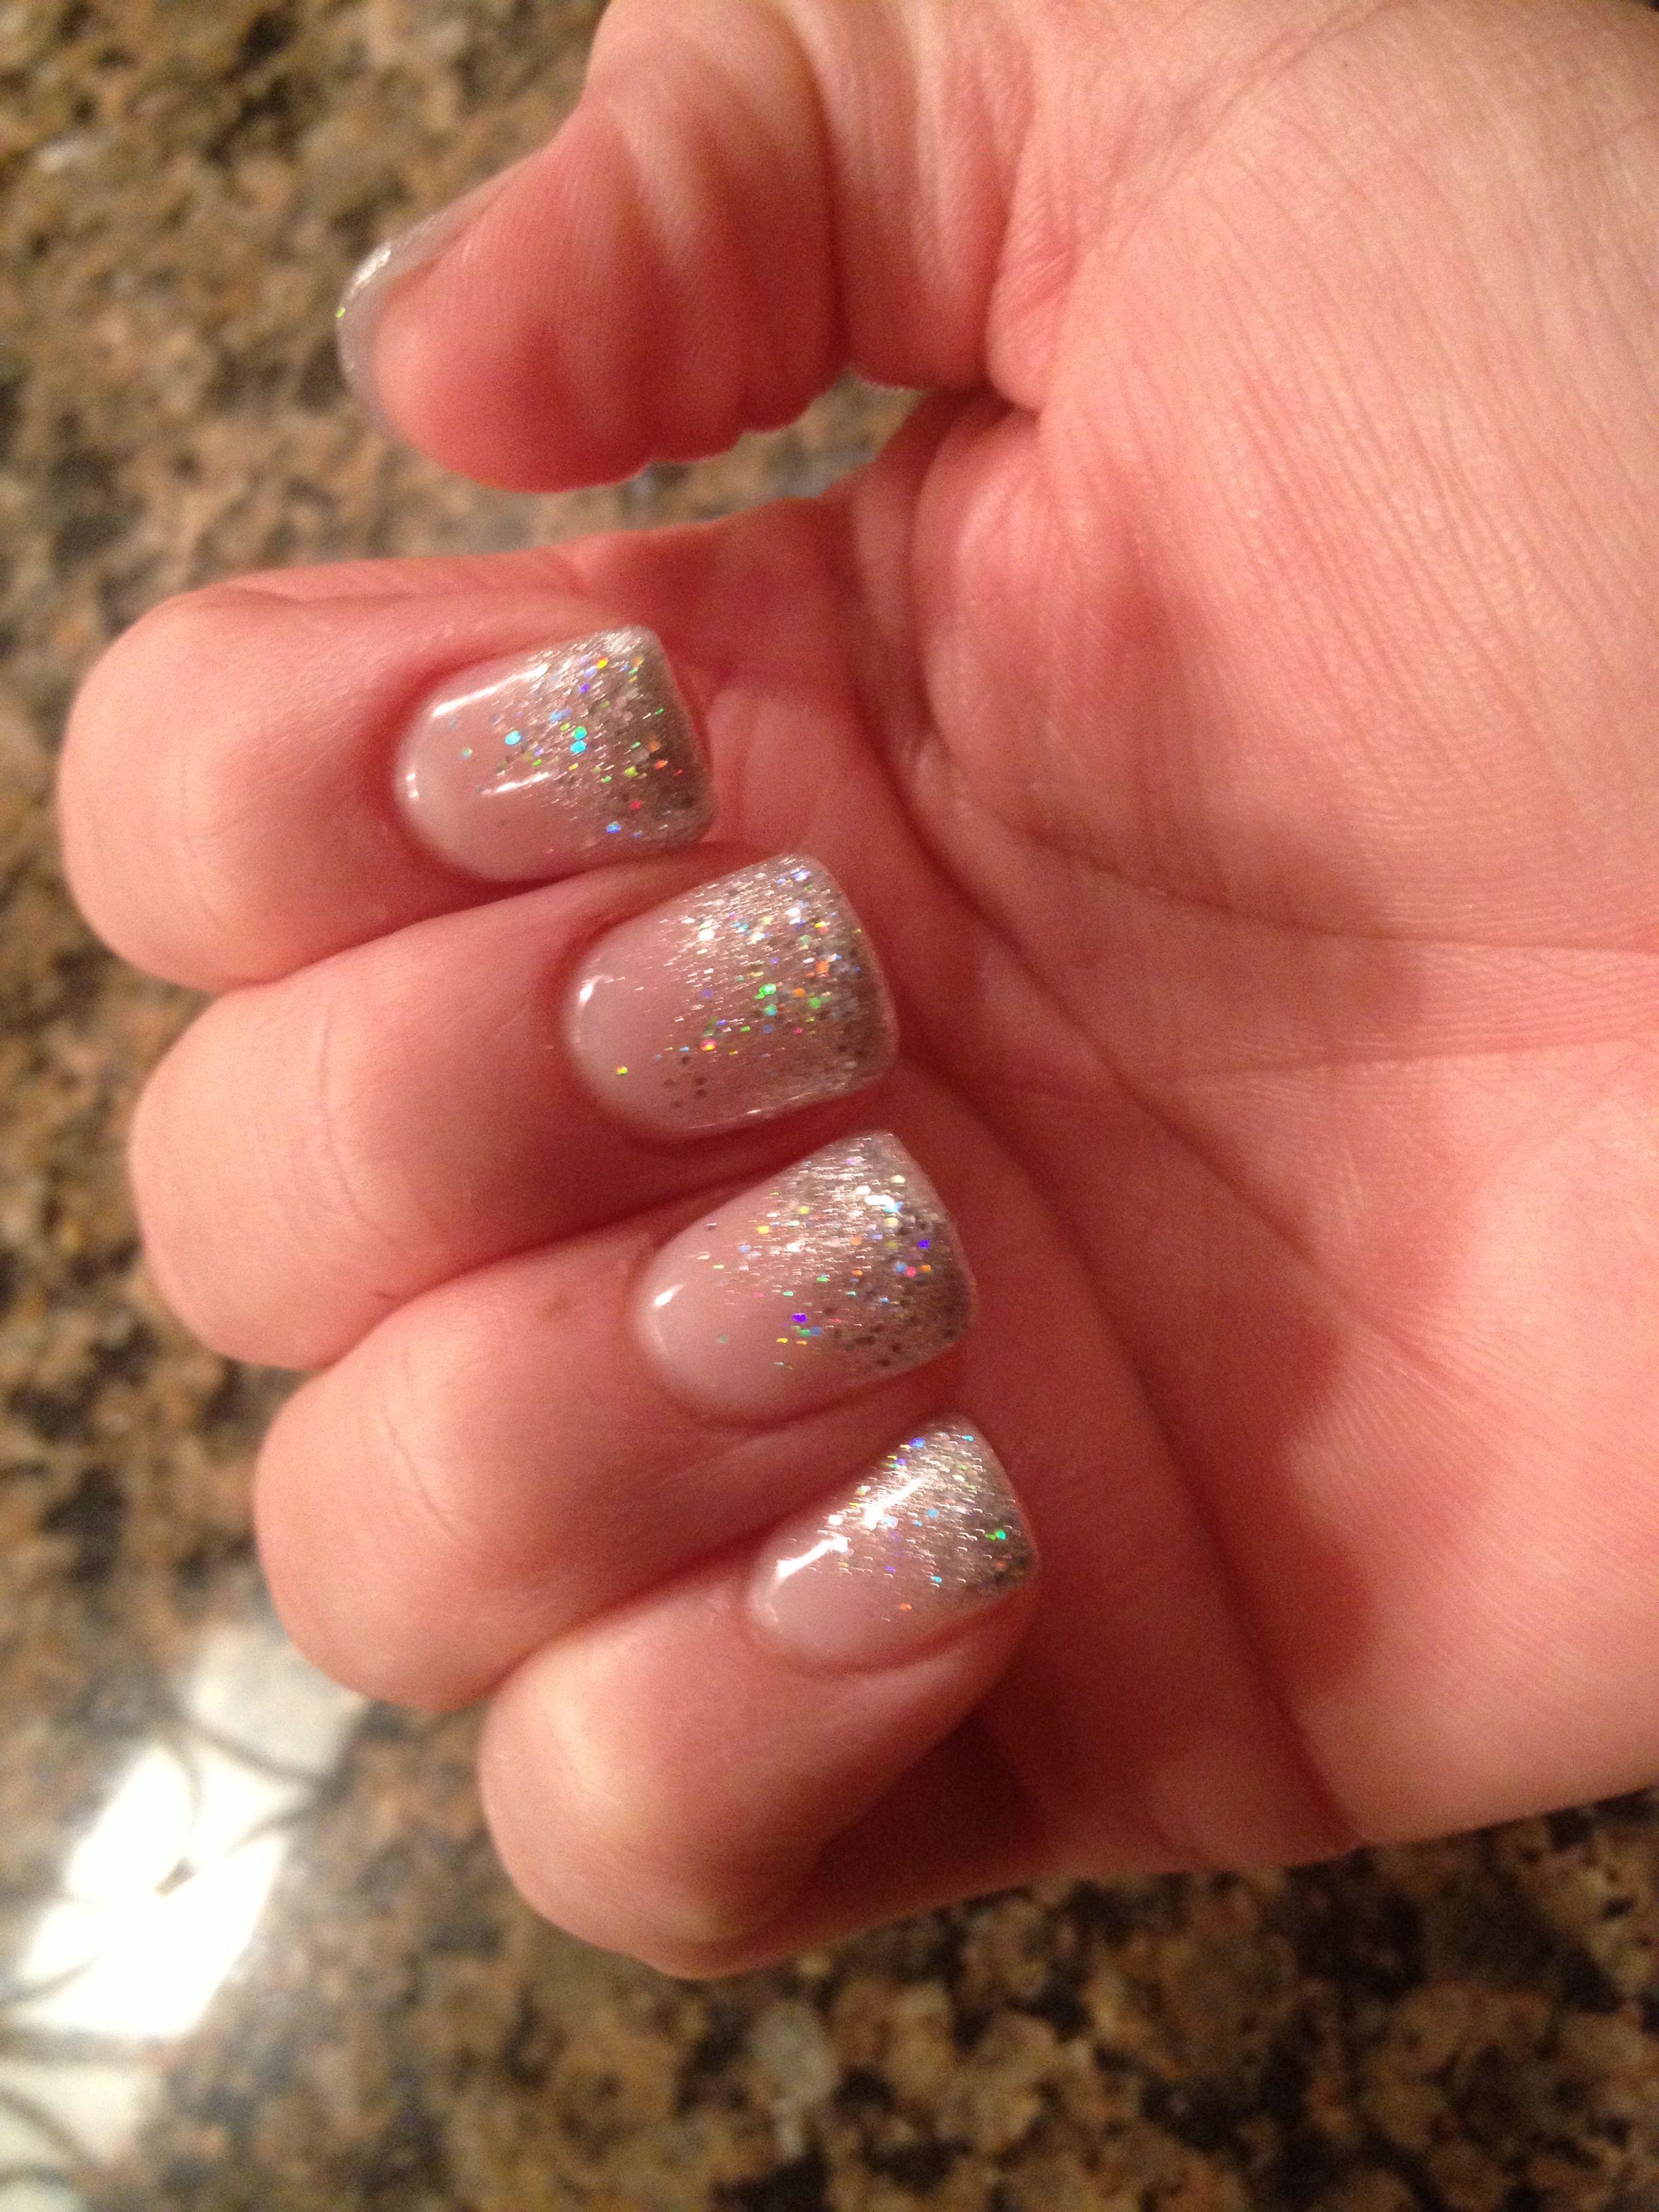 Glitter gel acrylic nails | Beauty | Pinterest | Gel acrylic nails ...